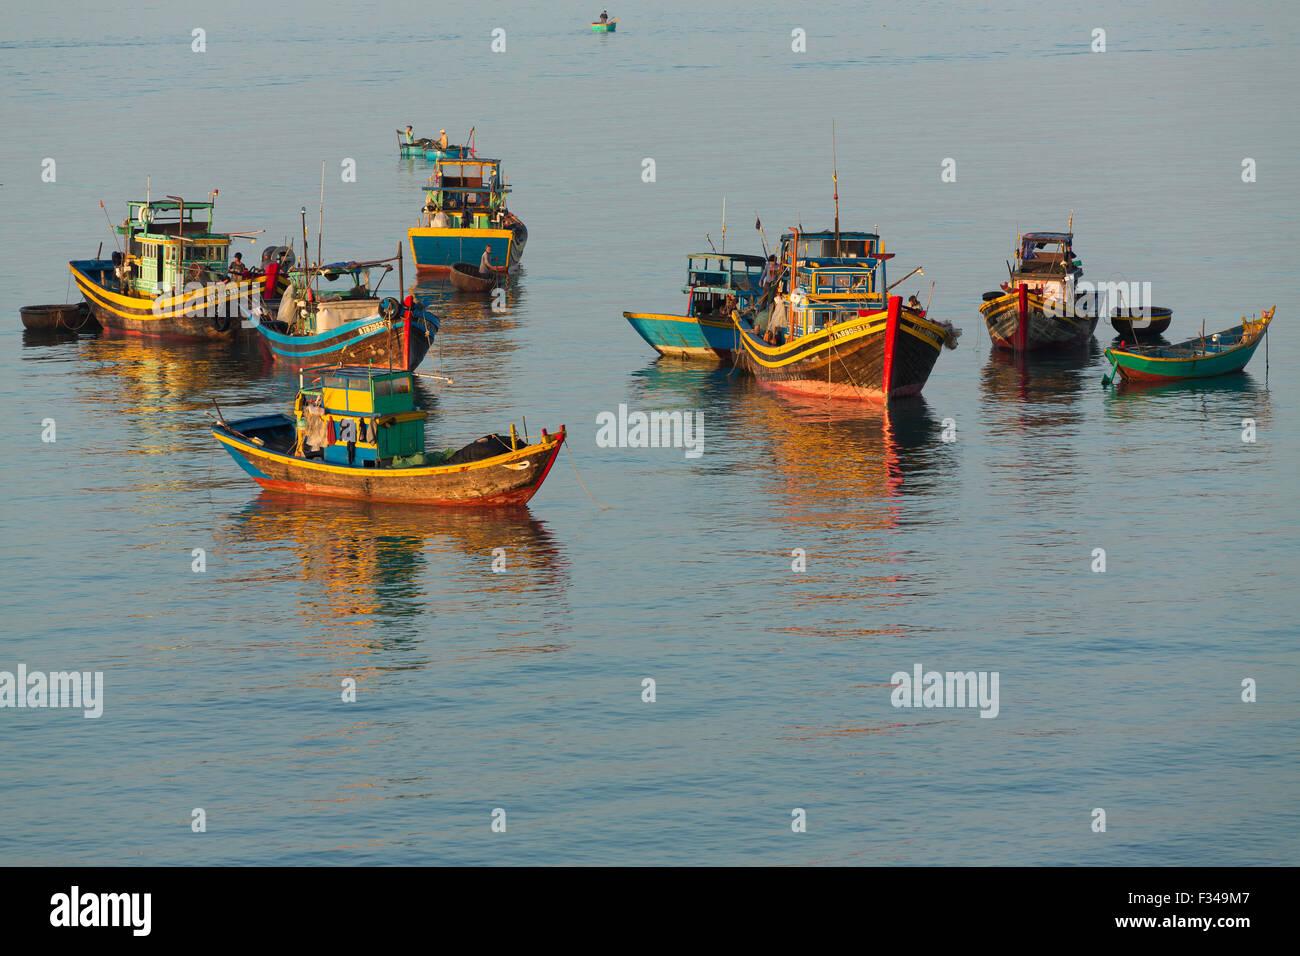 boats anchored off Mũi Né fishing village, Bình Thuận Province, Vietnam - Stock Image